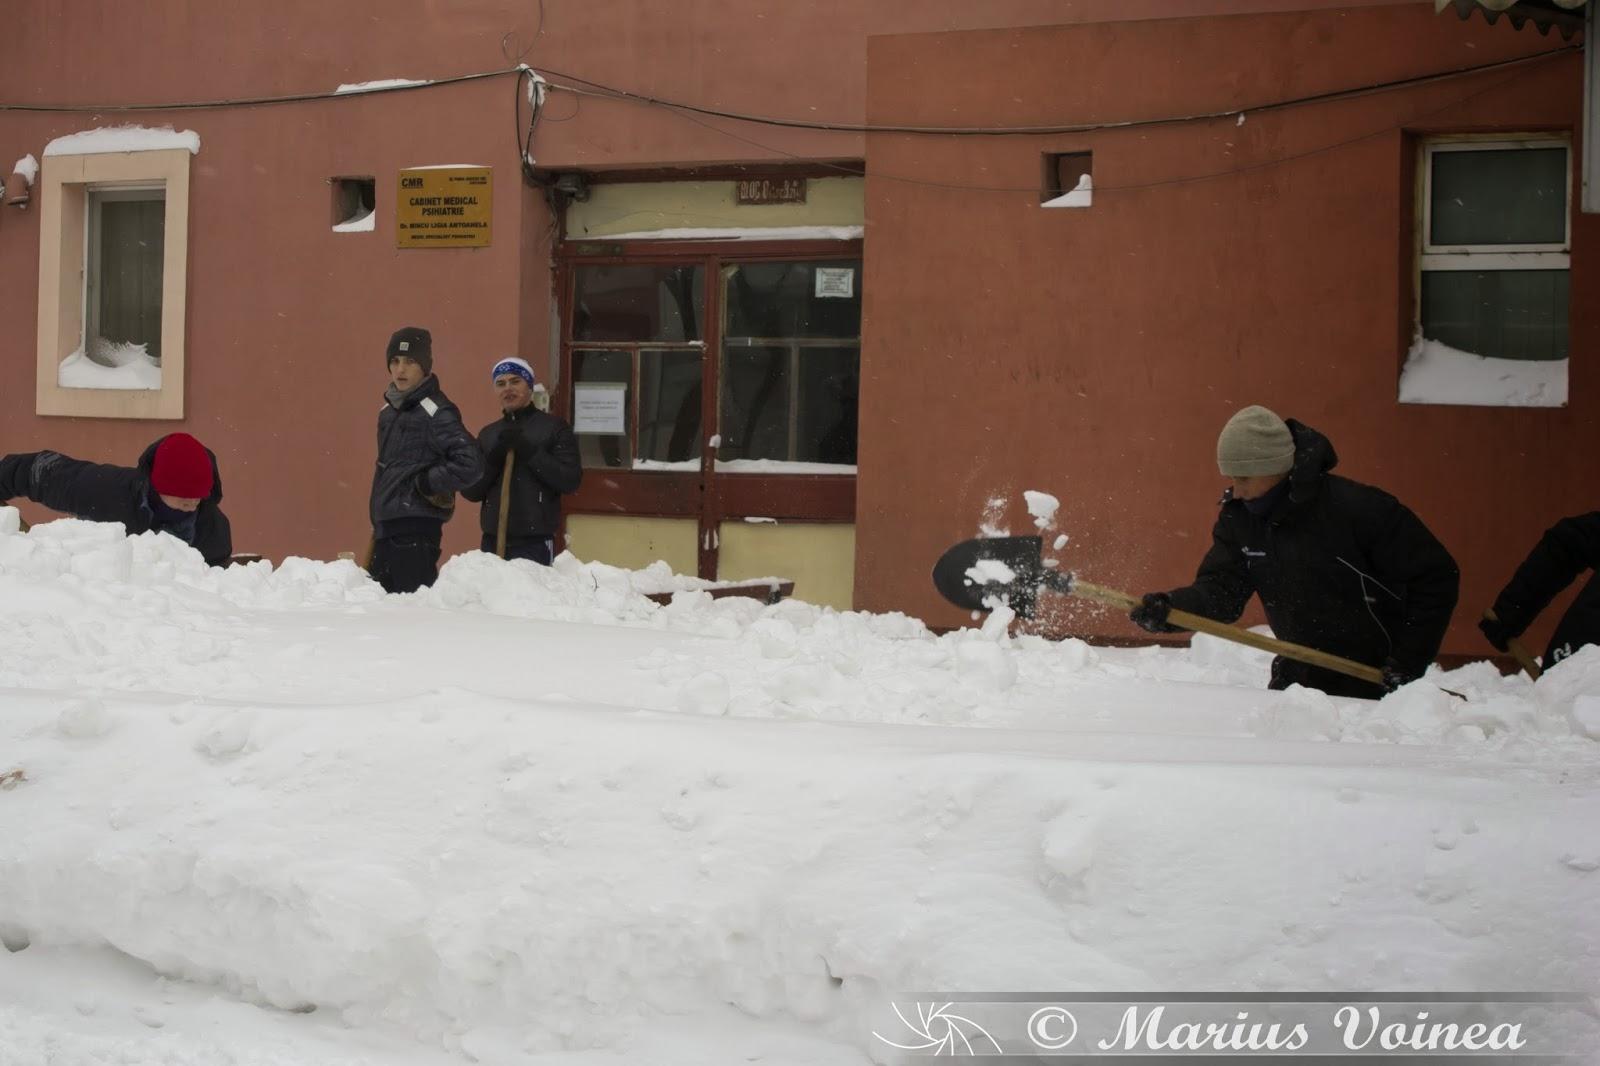 iarna la ramnicu sarat, 2014 foto 10